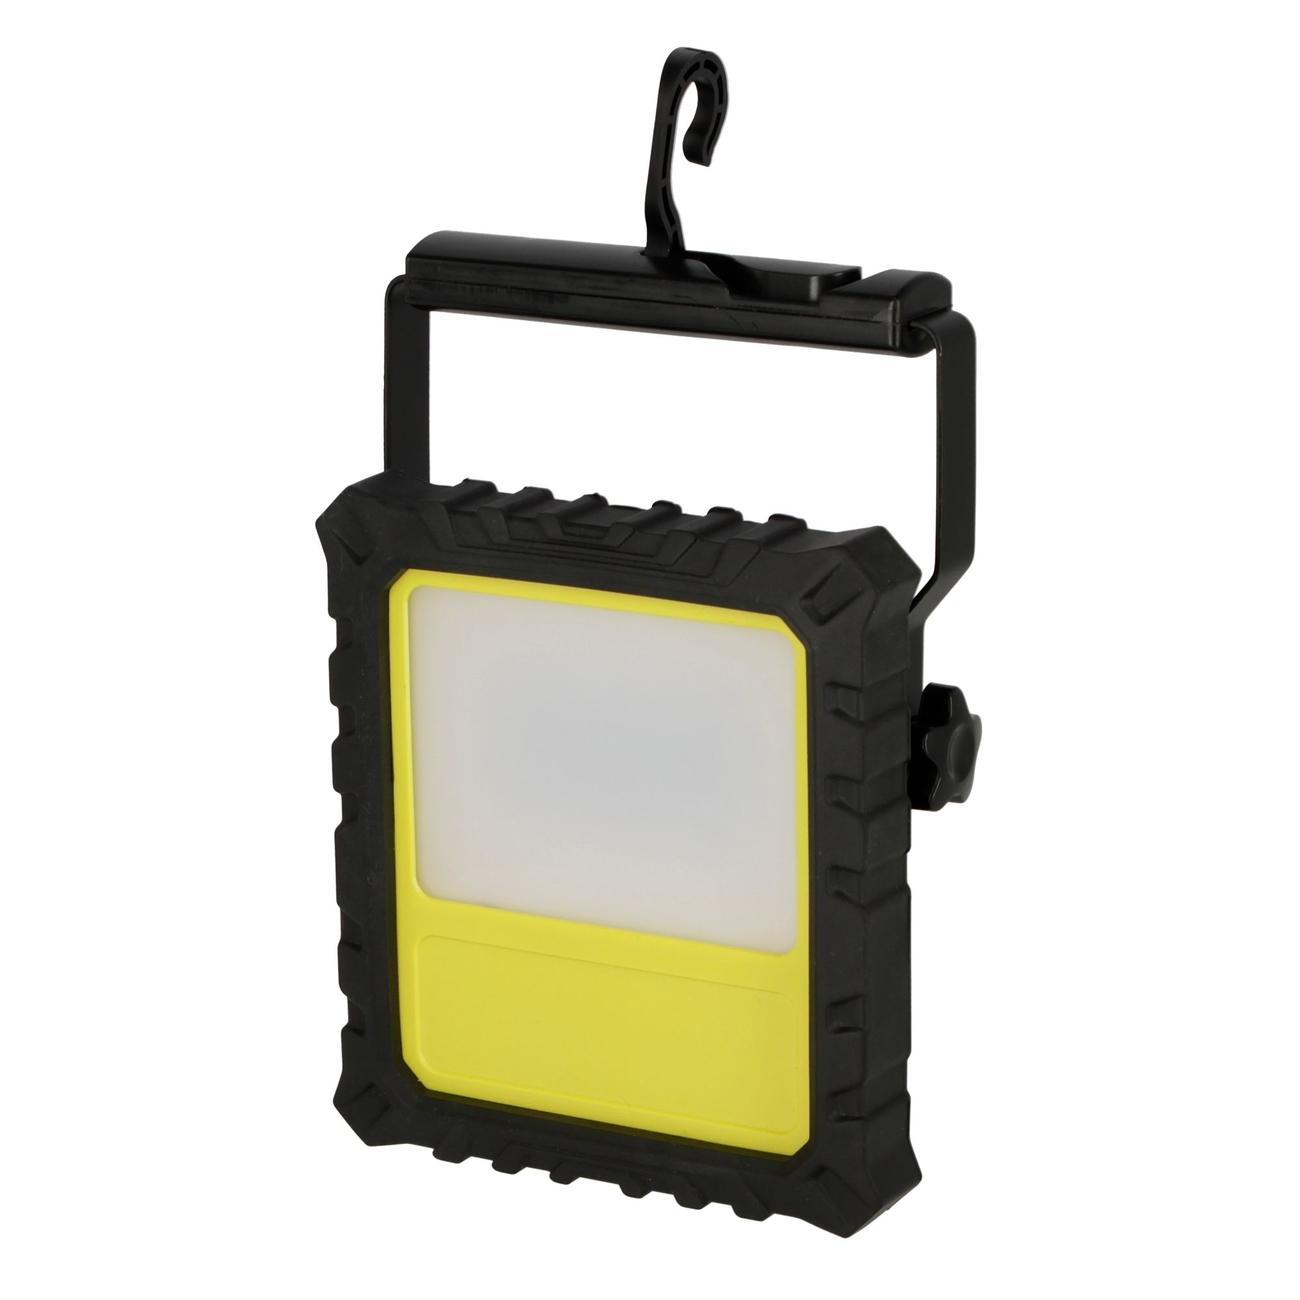 Kerbl Mobiler LED Akku Strahler WorkFire Pro, Bild 2